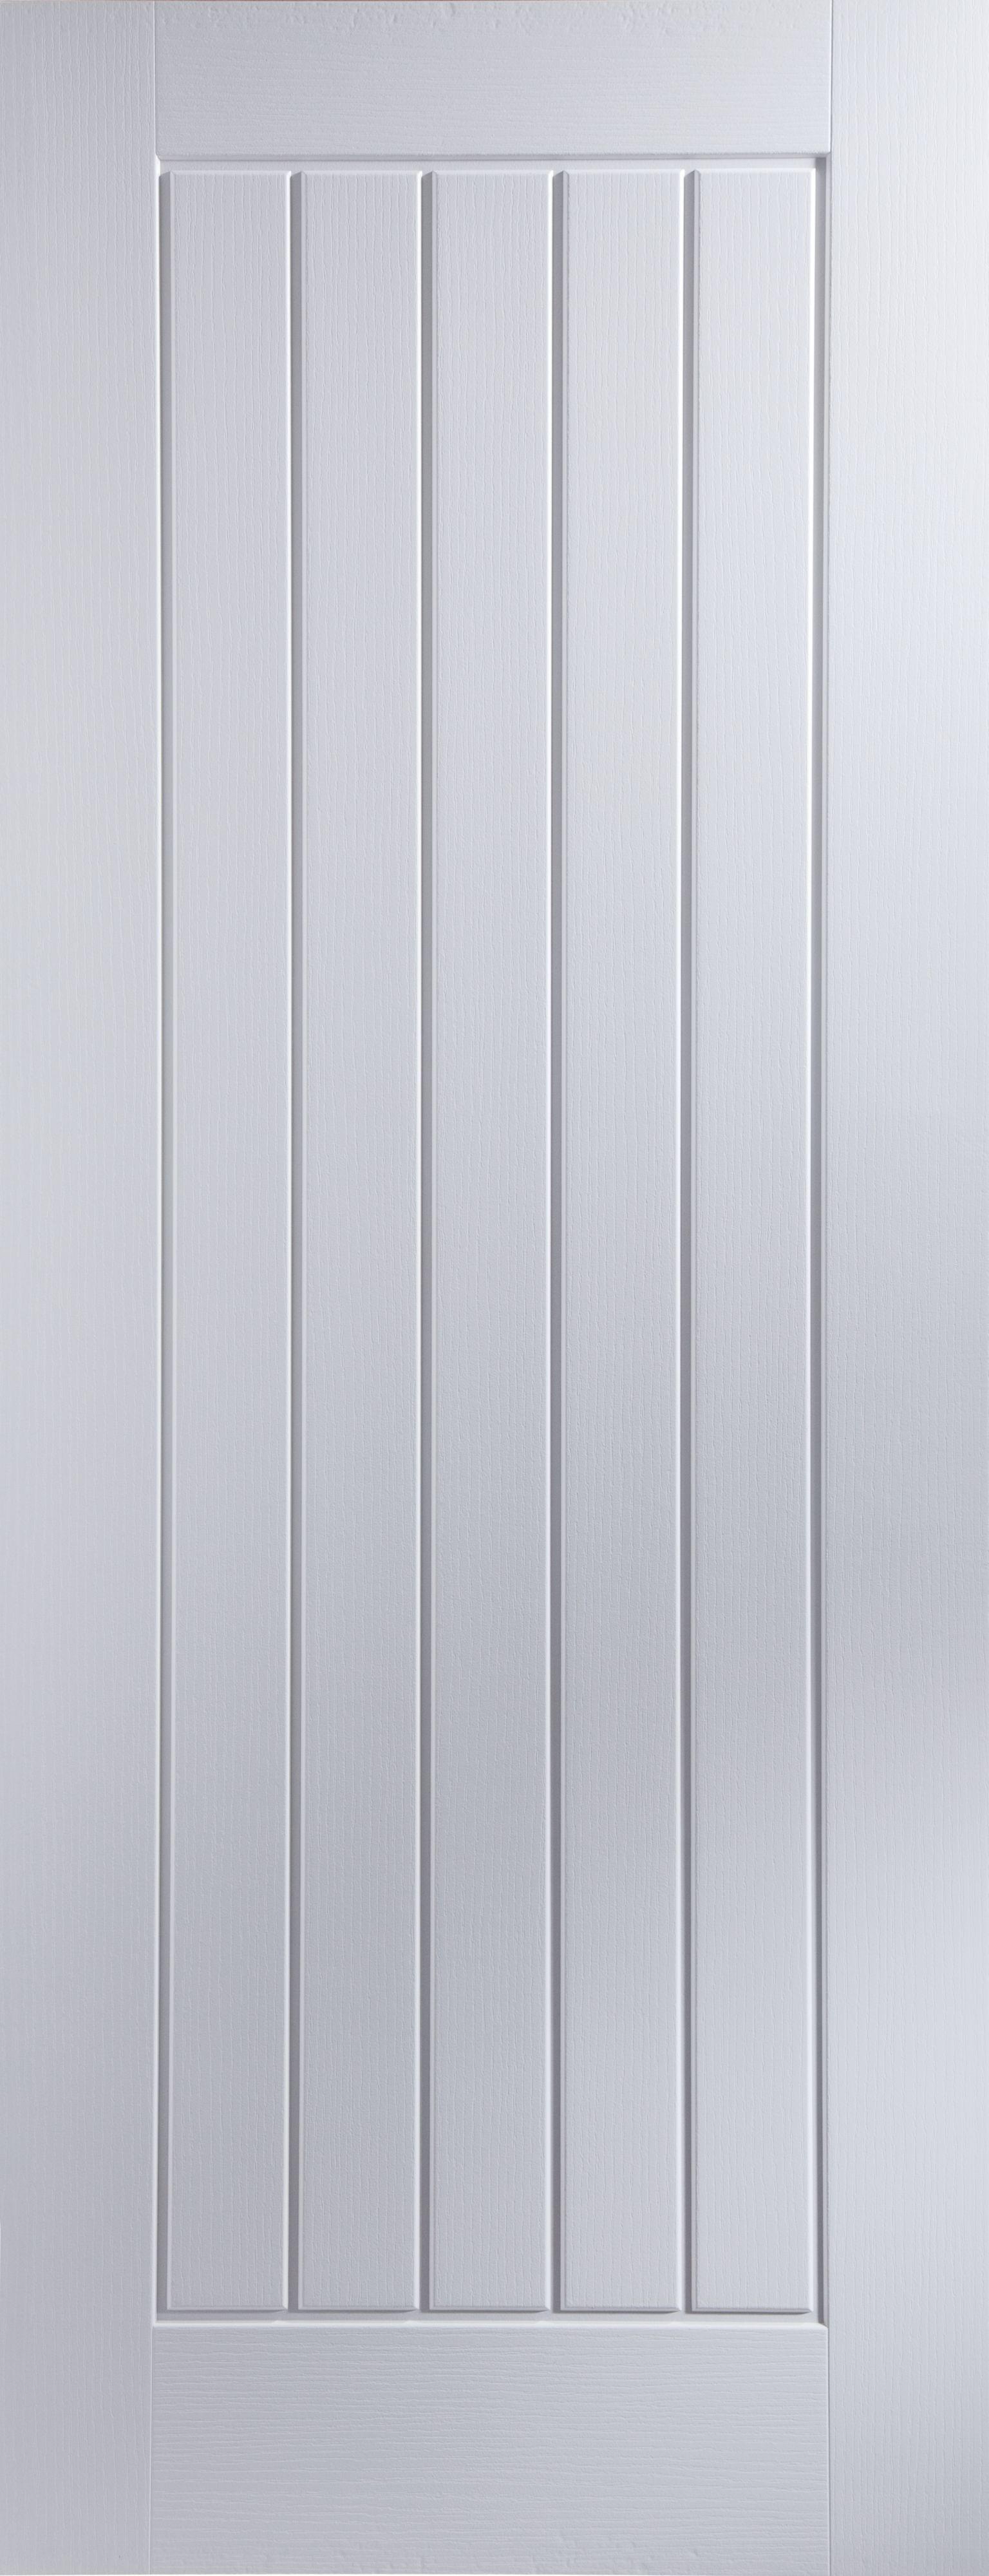 Cottage Panel Pre Painted White Woodgrain Unglazed Internal Standard Door H1981mm W762mm